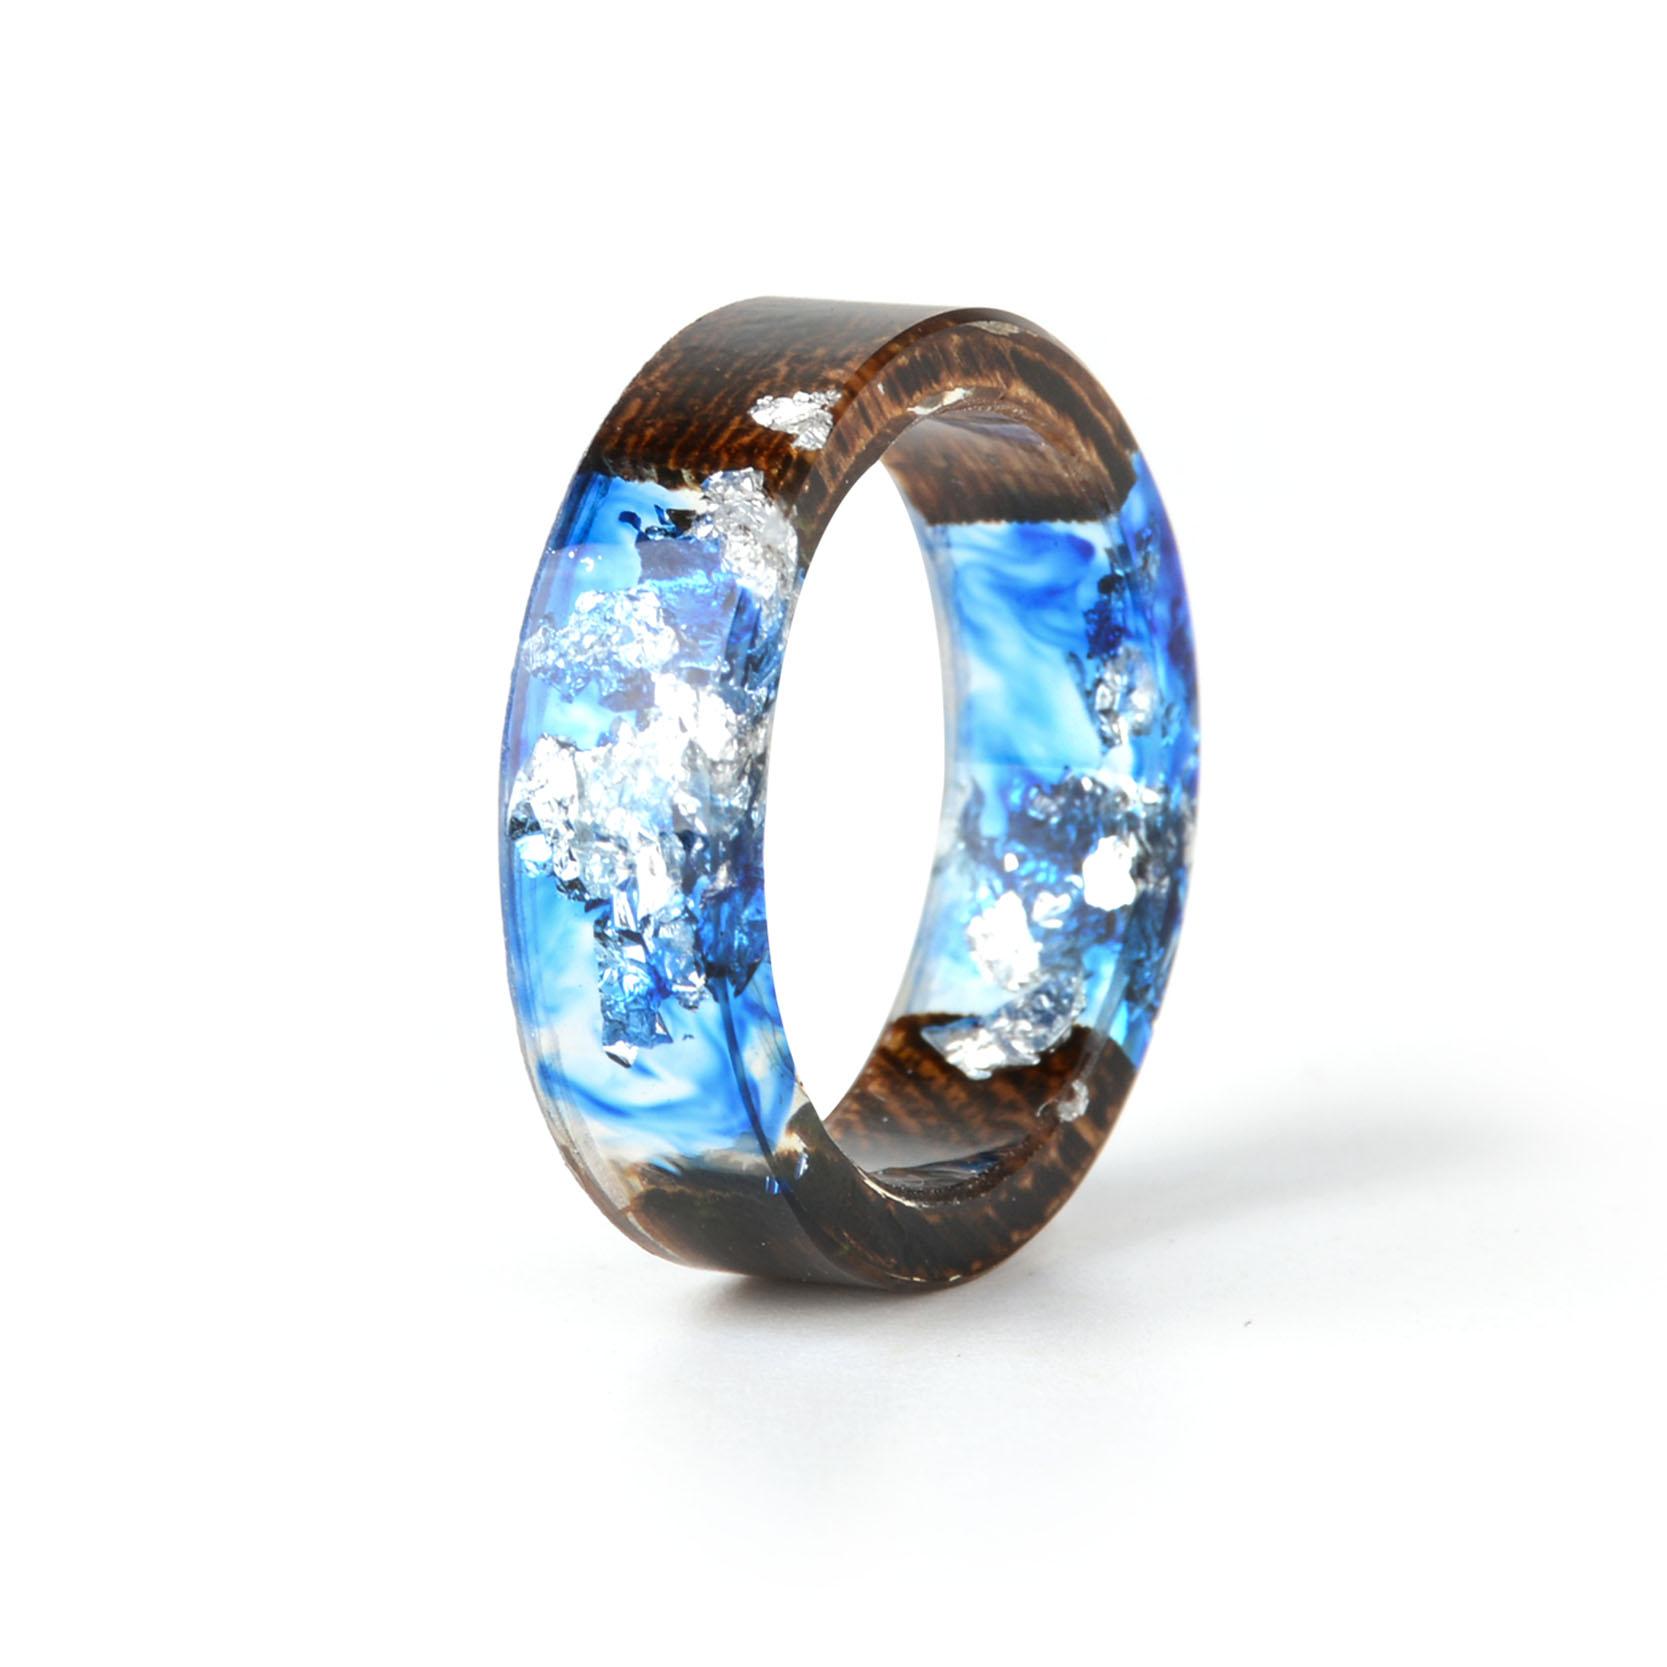 Clear Wood Resin Ring Handmade Dried Flower Hand Jewellery 13